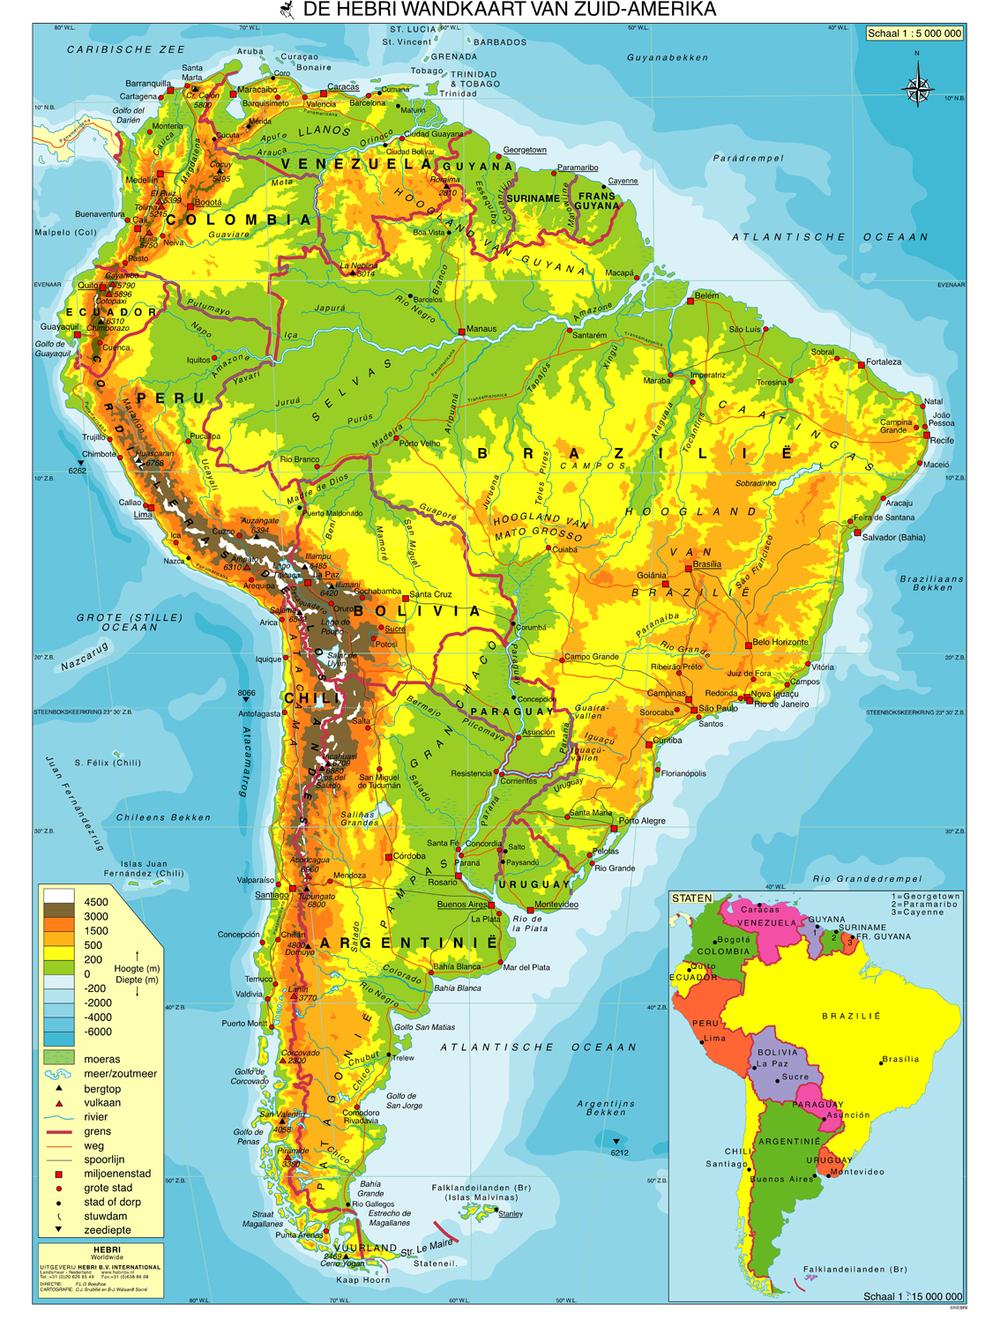 Zuid-Amerika (eindexamen 2017)